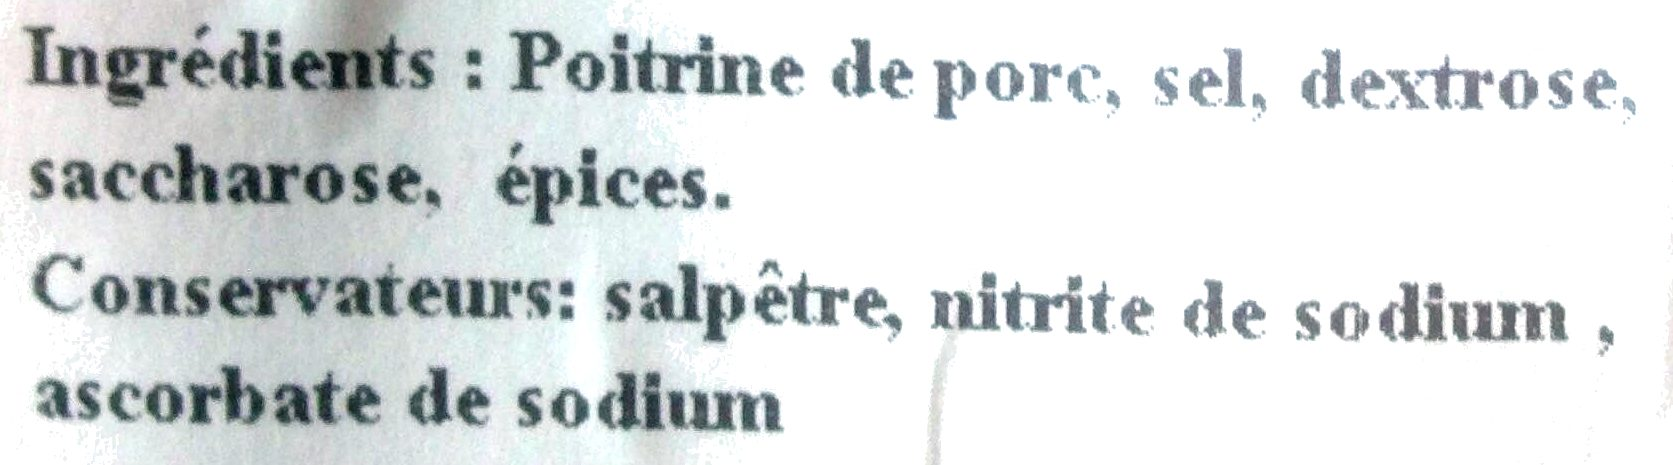 Poitrine Plate campagne - Ingrediënten